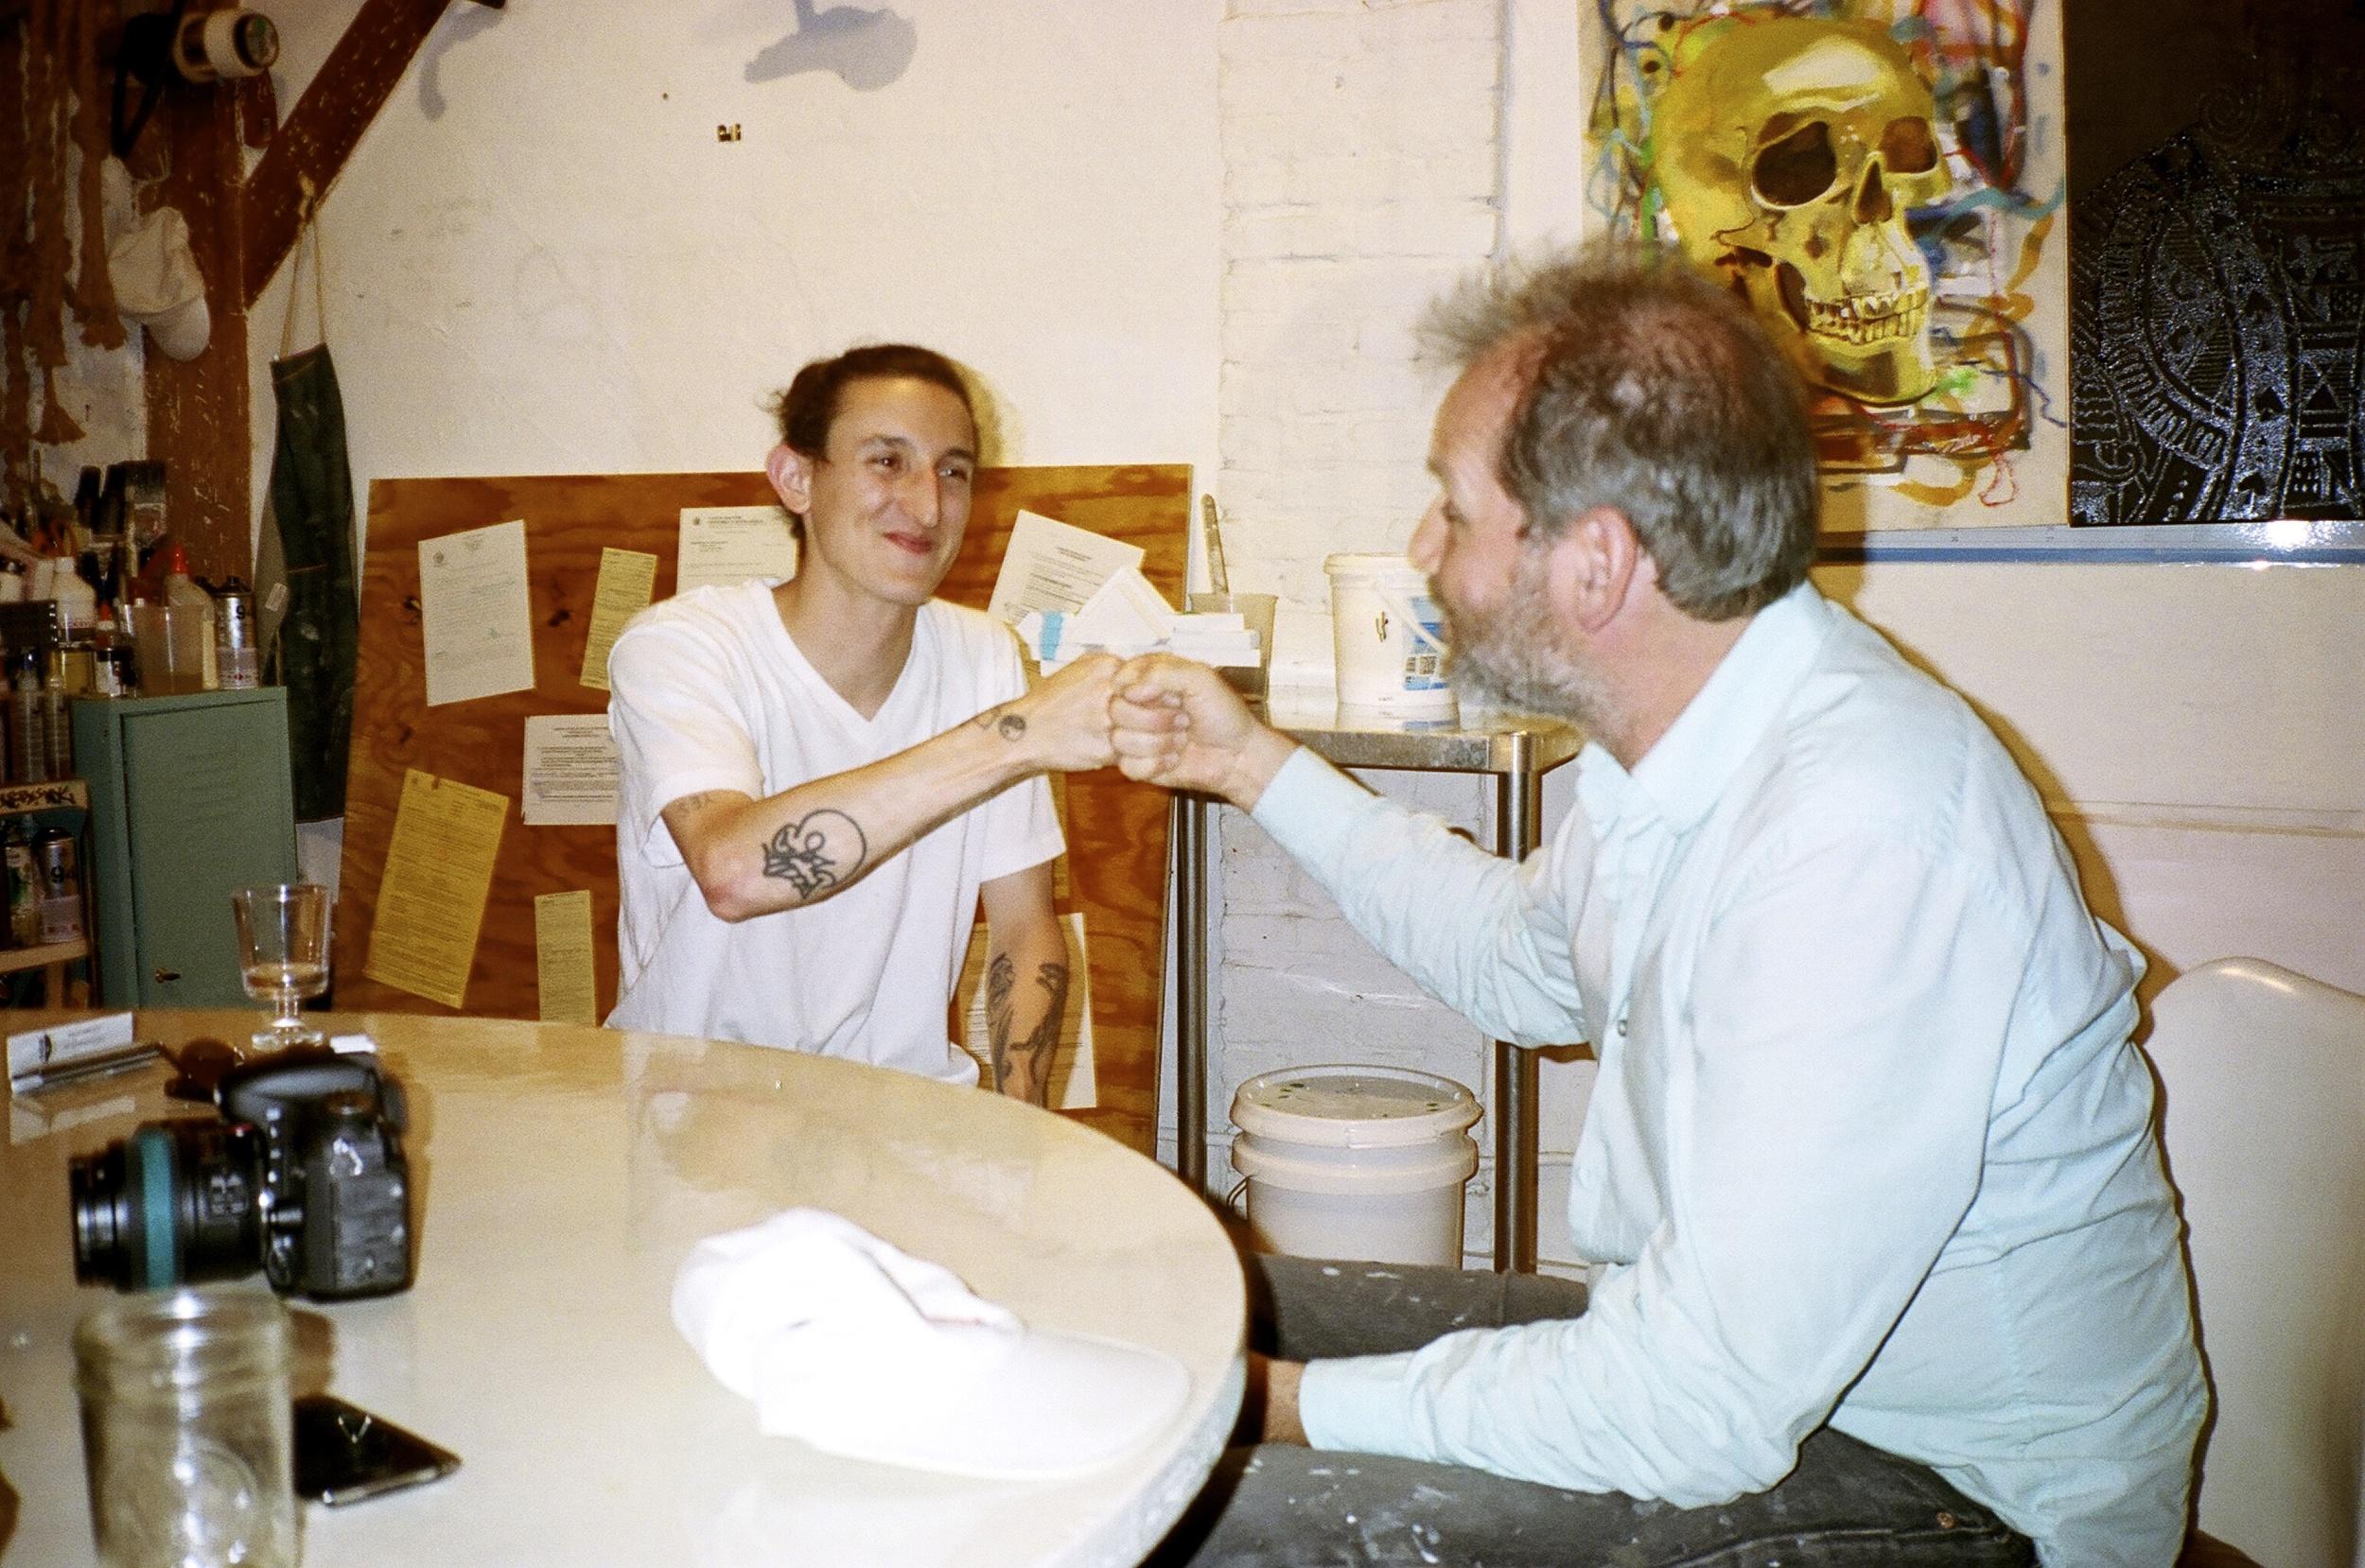 Jerami and Stephen Torton